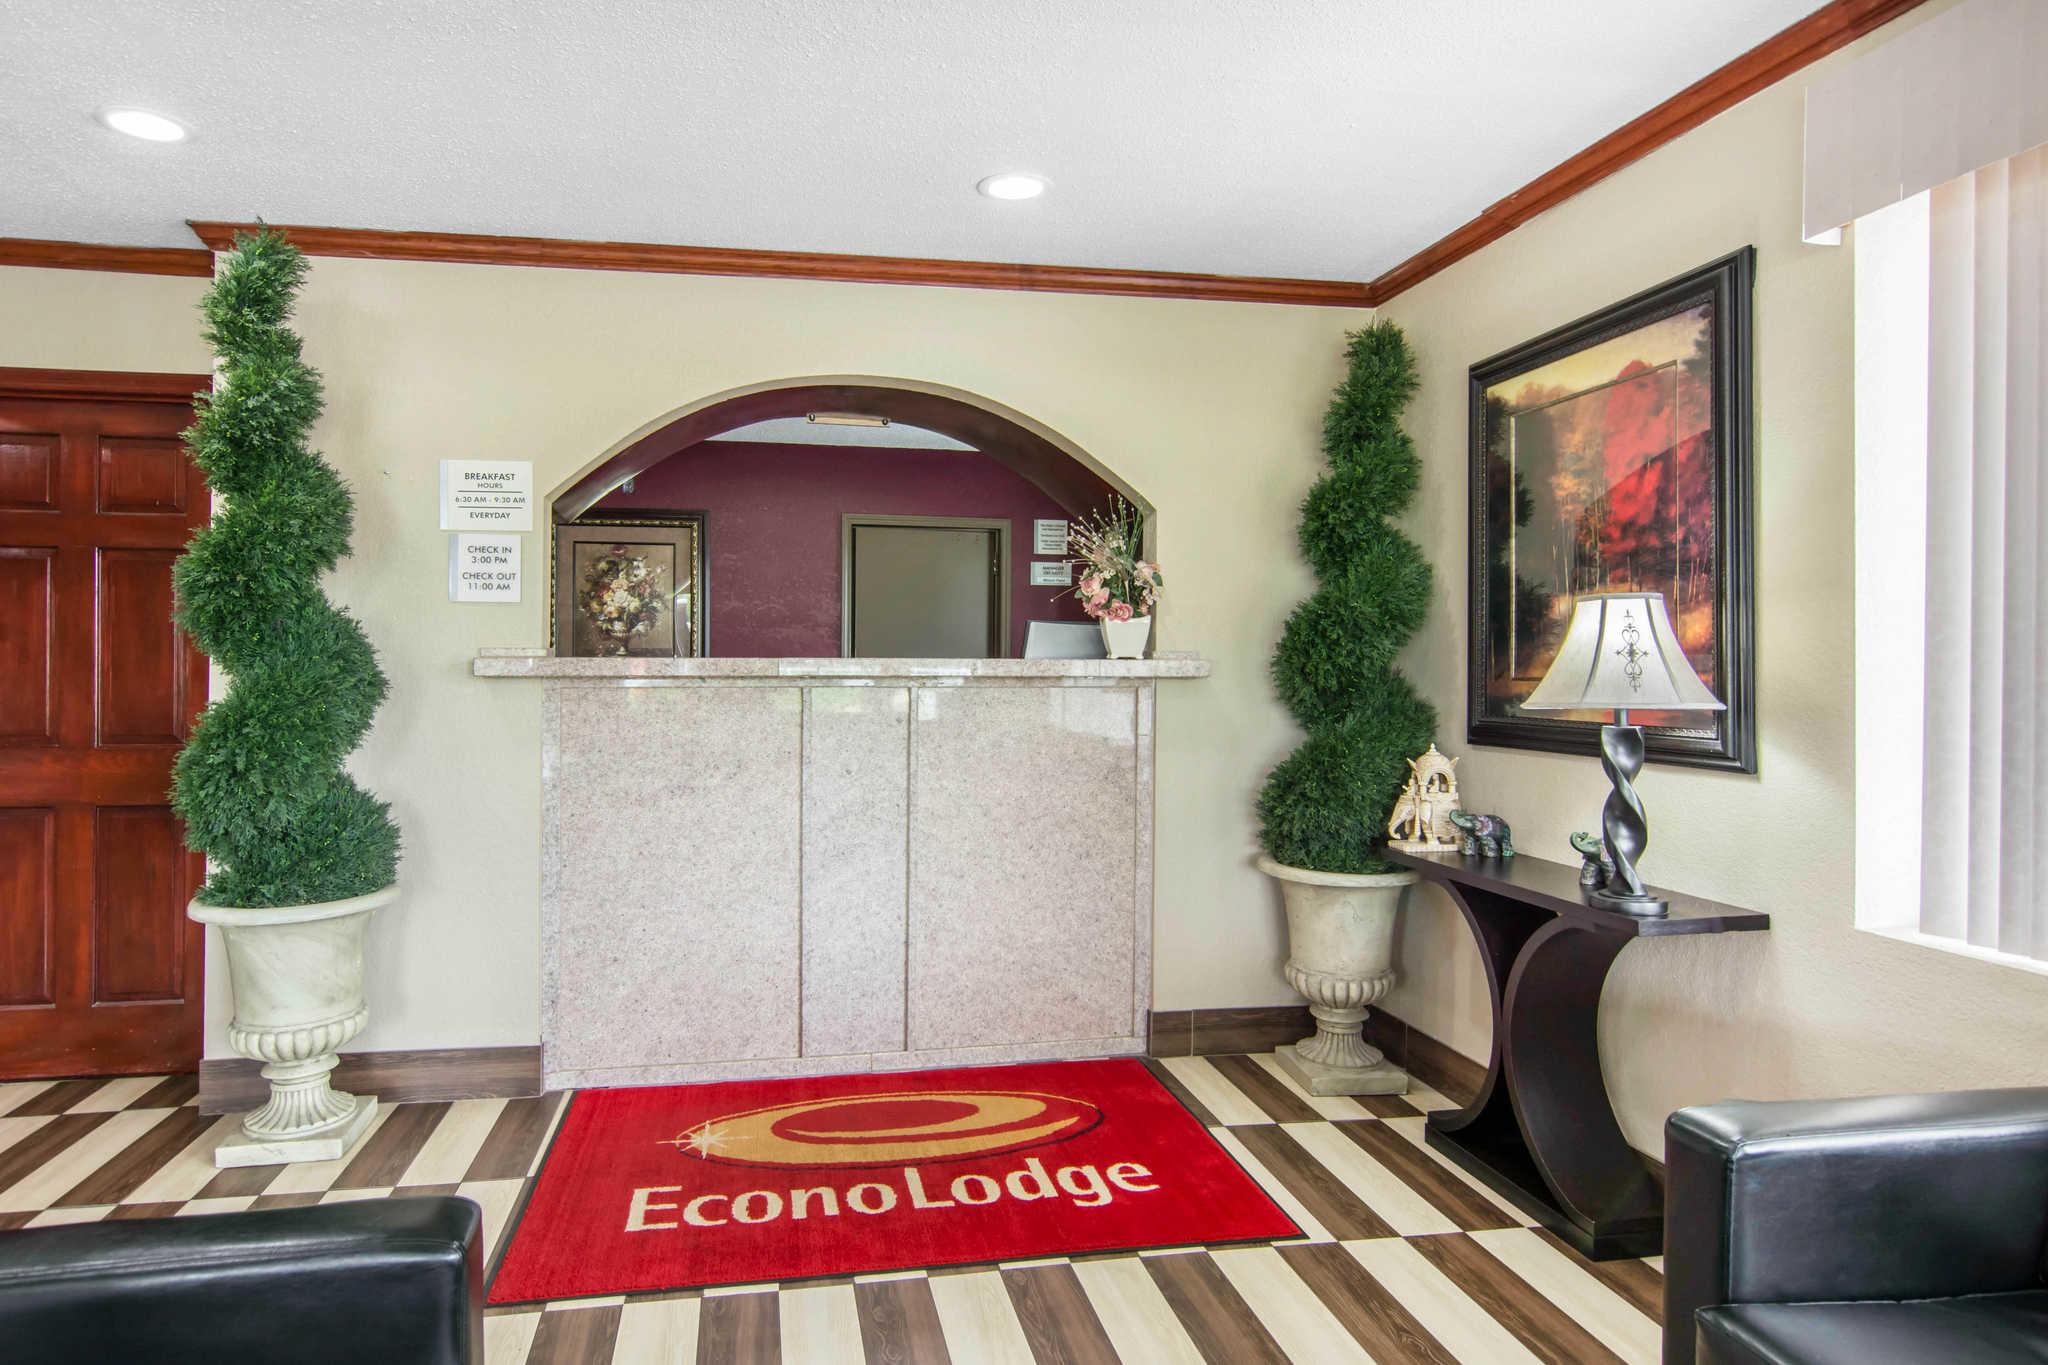 Econo Lodge image 2